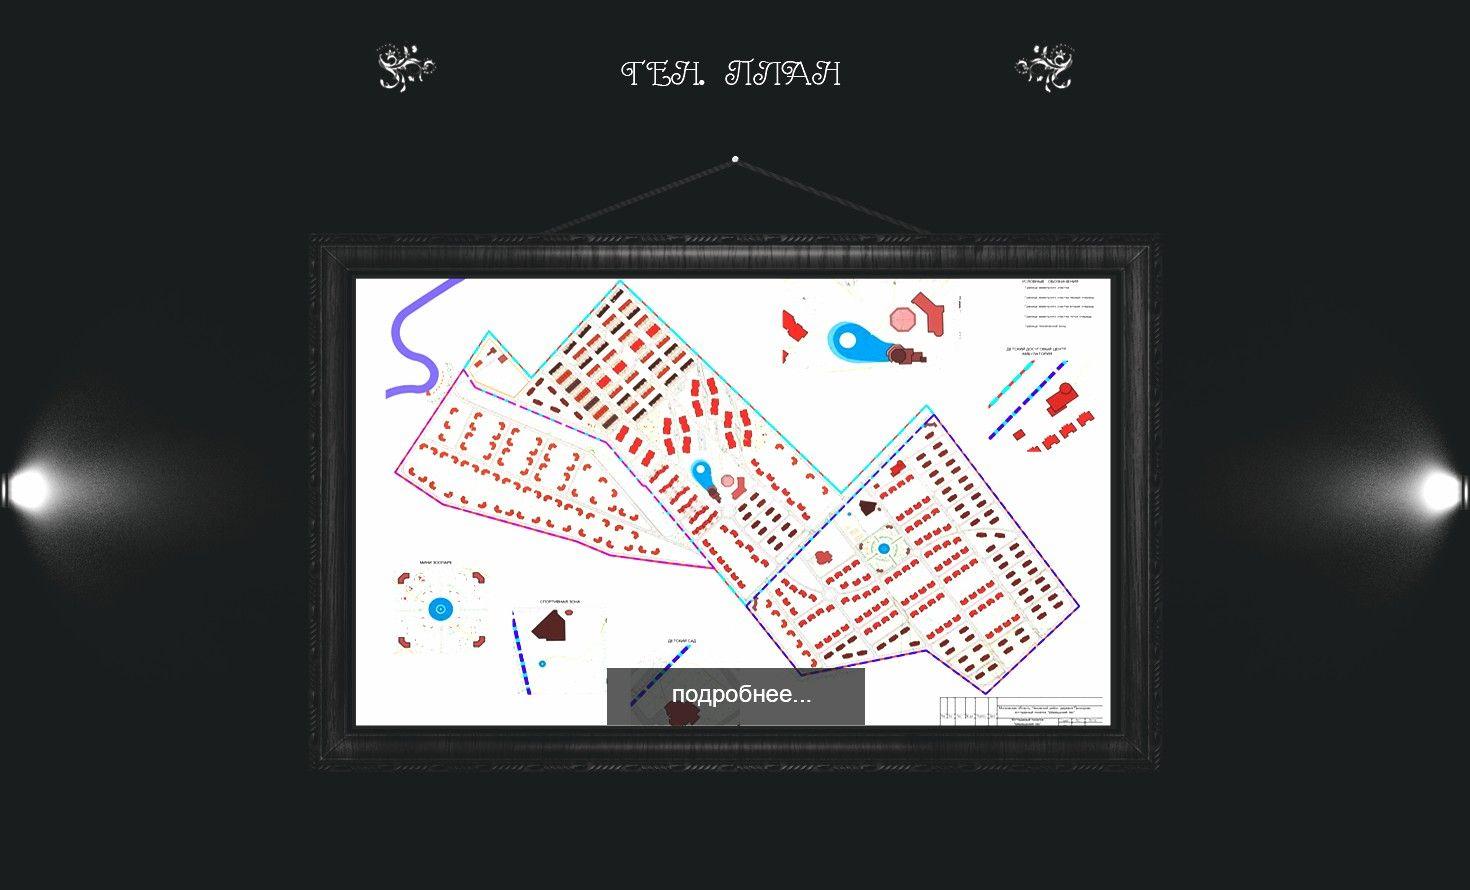 Сайт КП Шервудский Лес - дизайнер Armando11